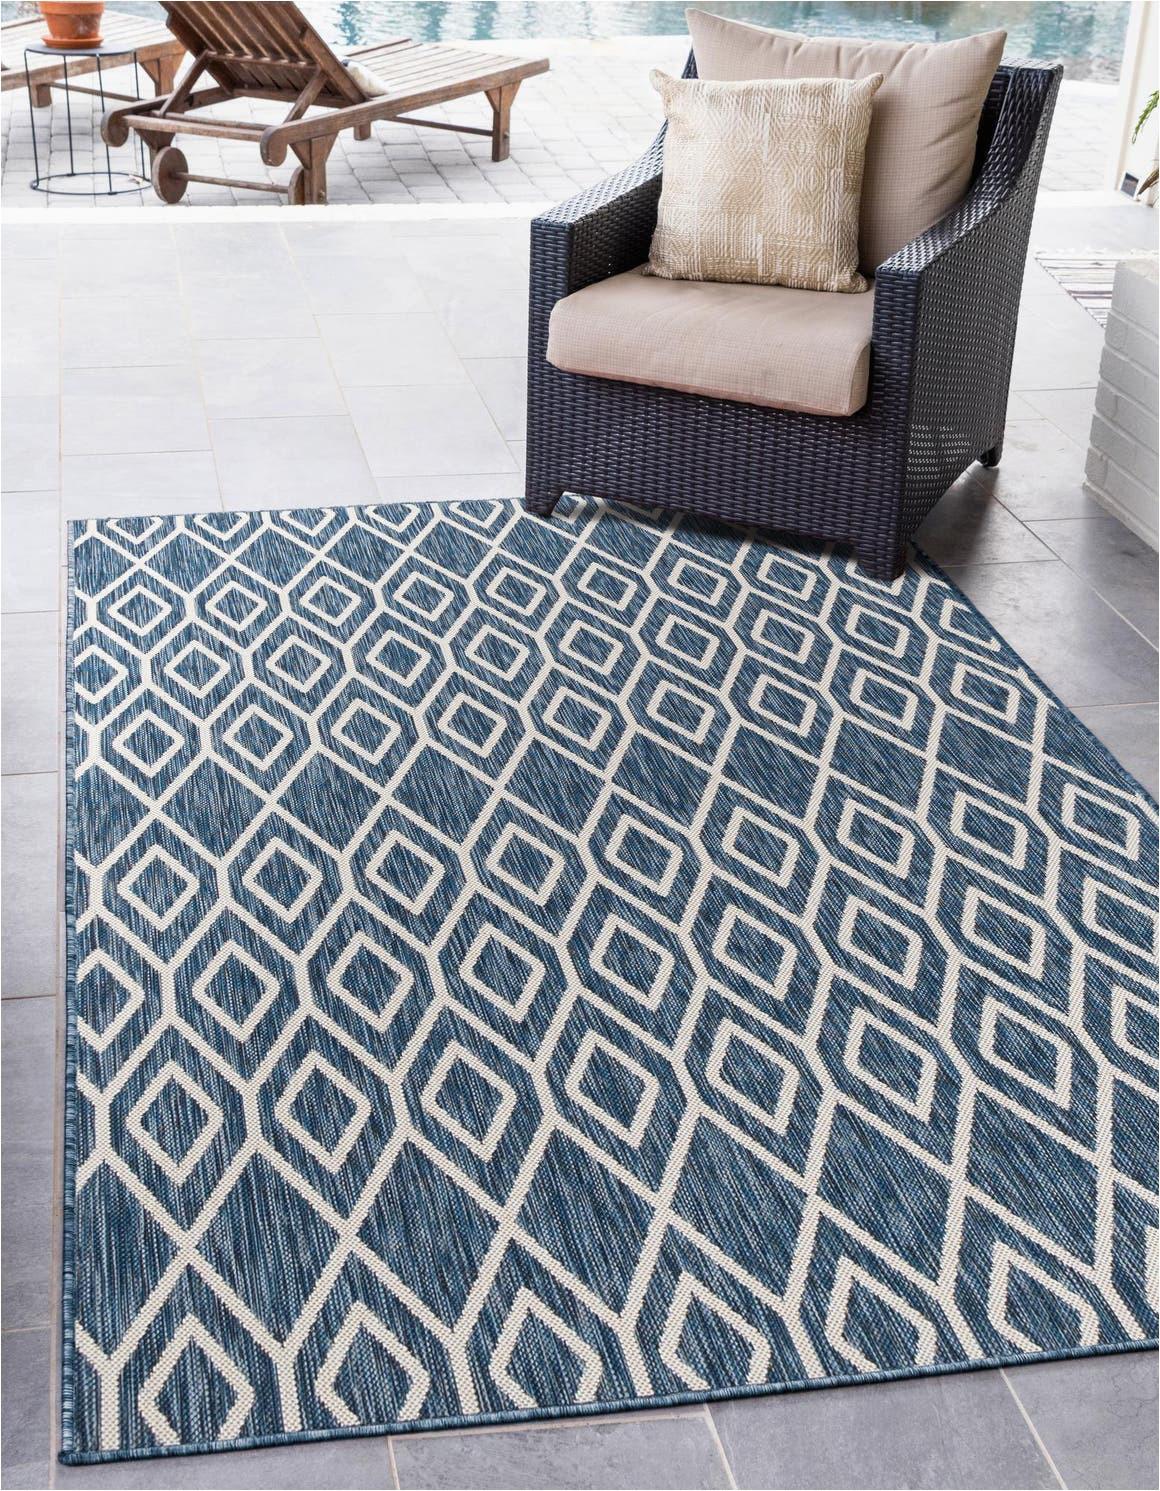 blue 9x12 jill zarin outdoor area rug